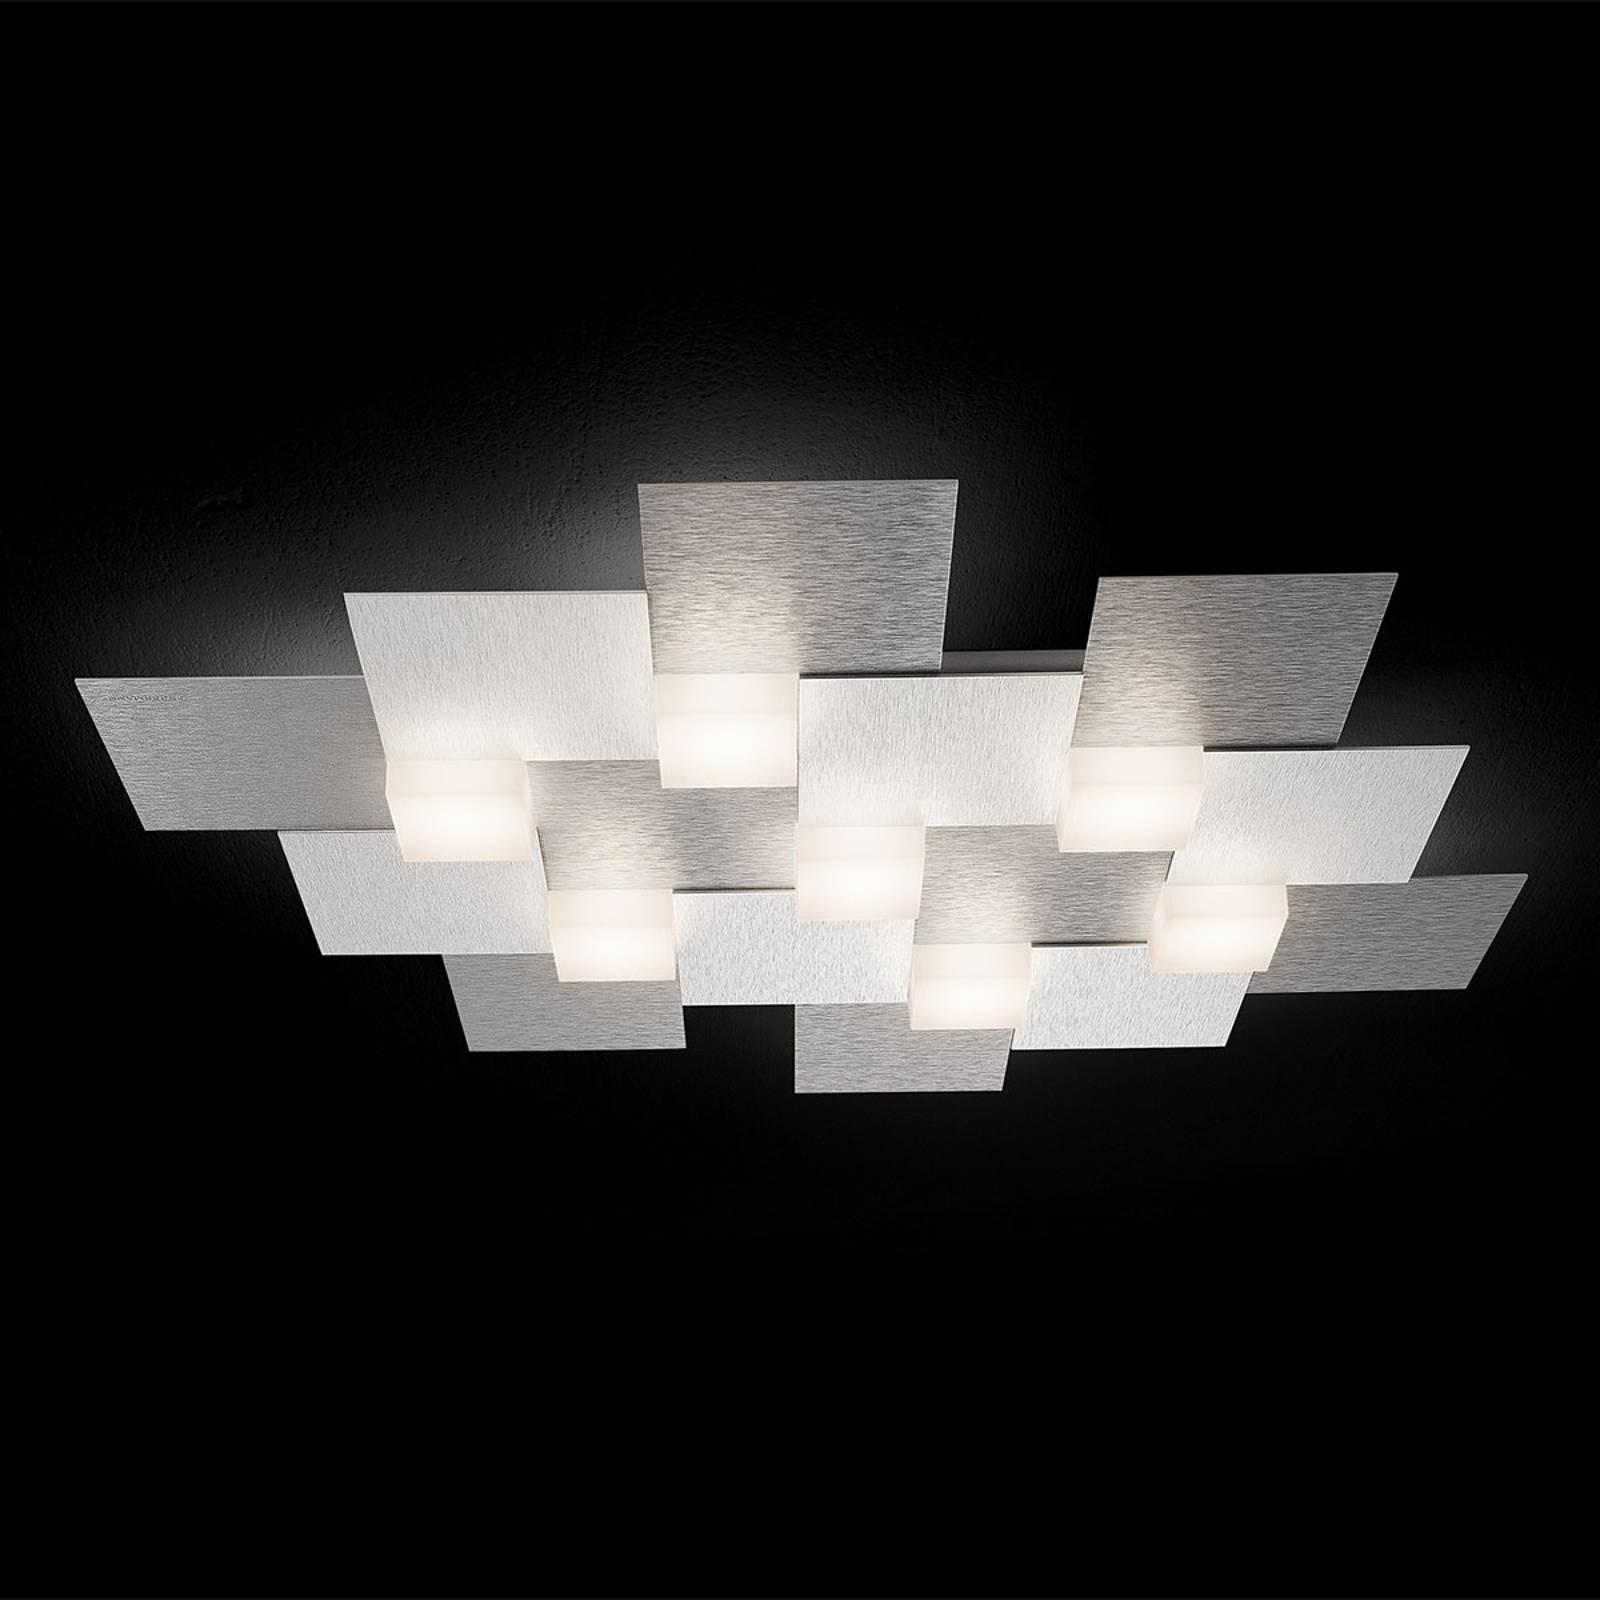 GROSSMANN Creo LED-kattovalaisin 7-lampp. alu